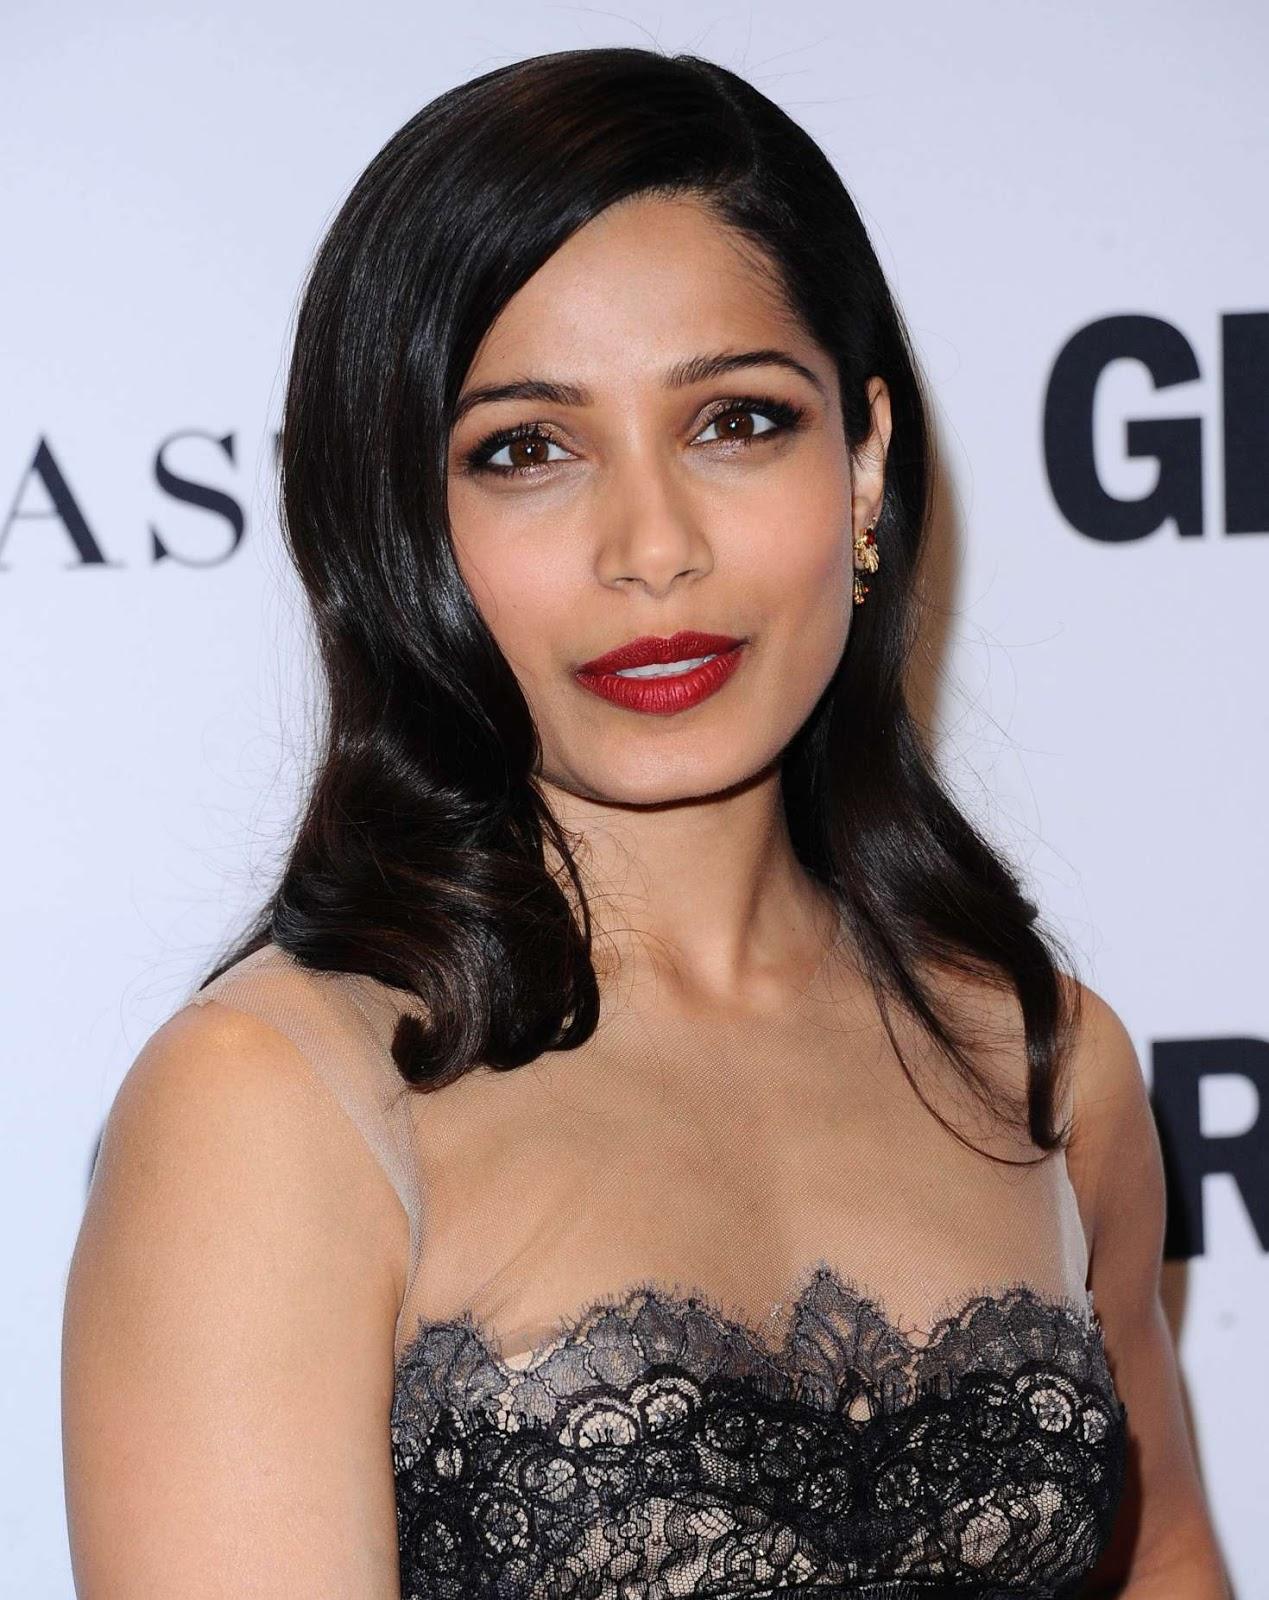 Welcome to Indian Bollywood Beauty: Slumdog Millionaire Beauty Freida Pinto Hot Bollywood Actress